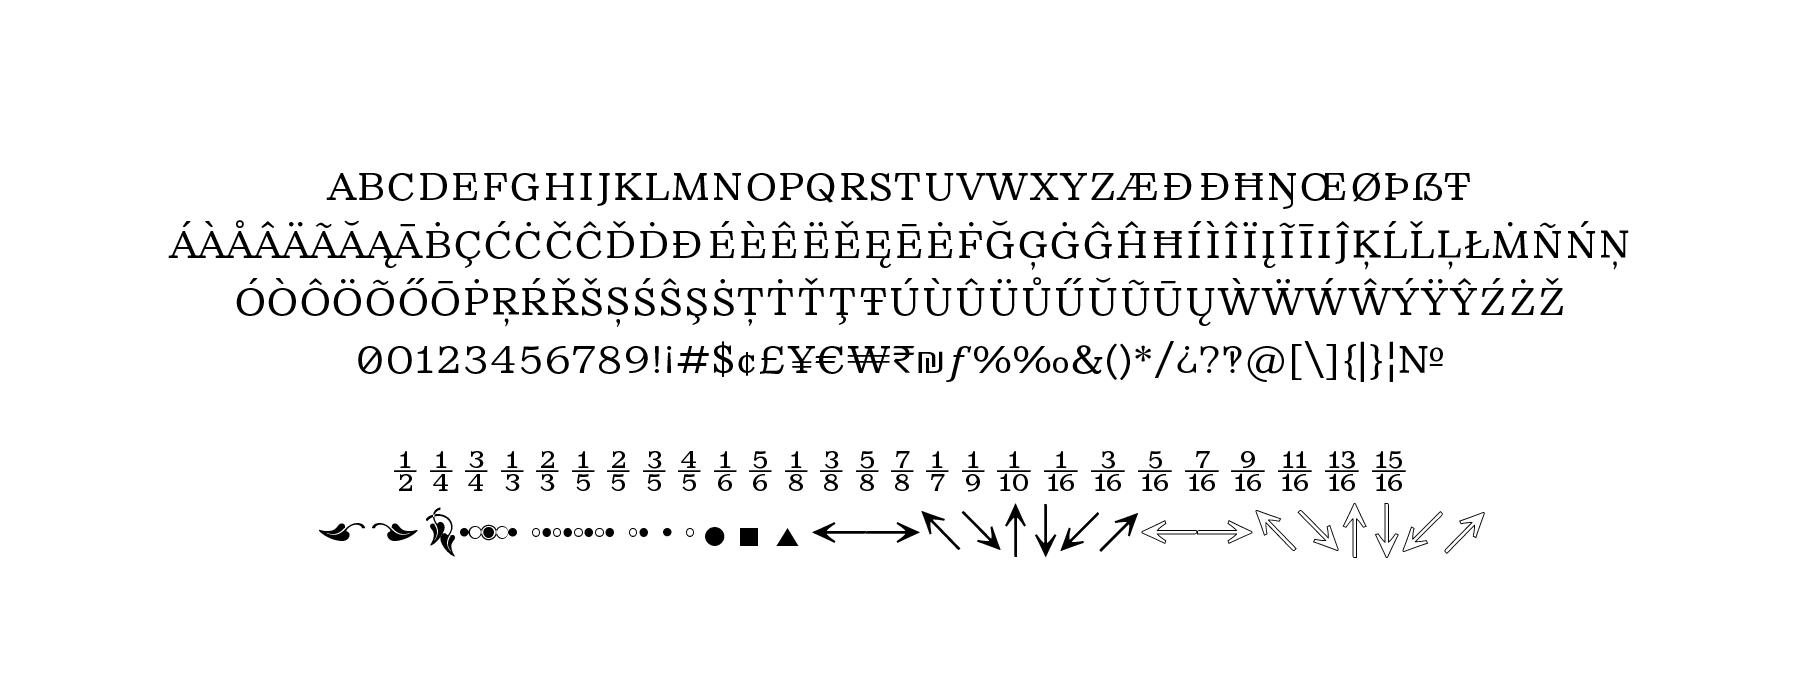 Rieux Character Set